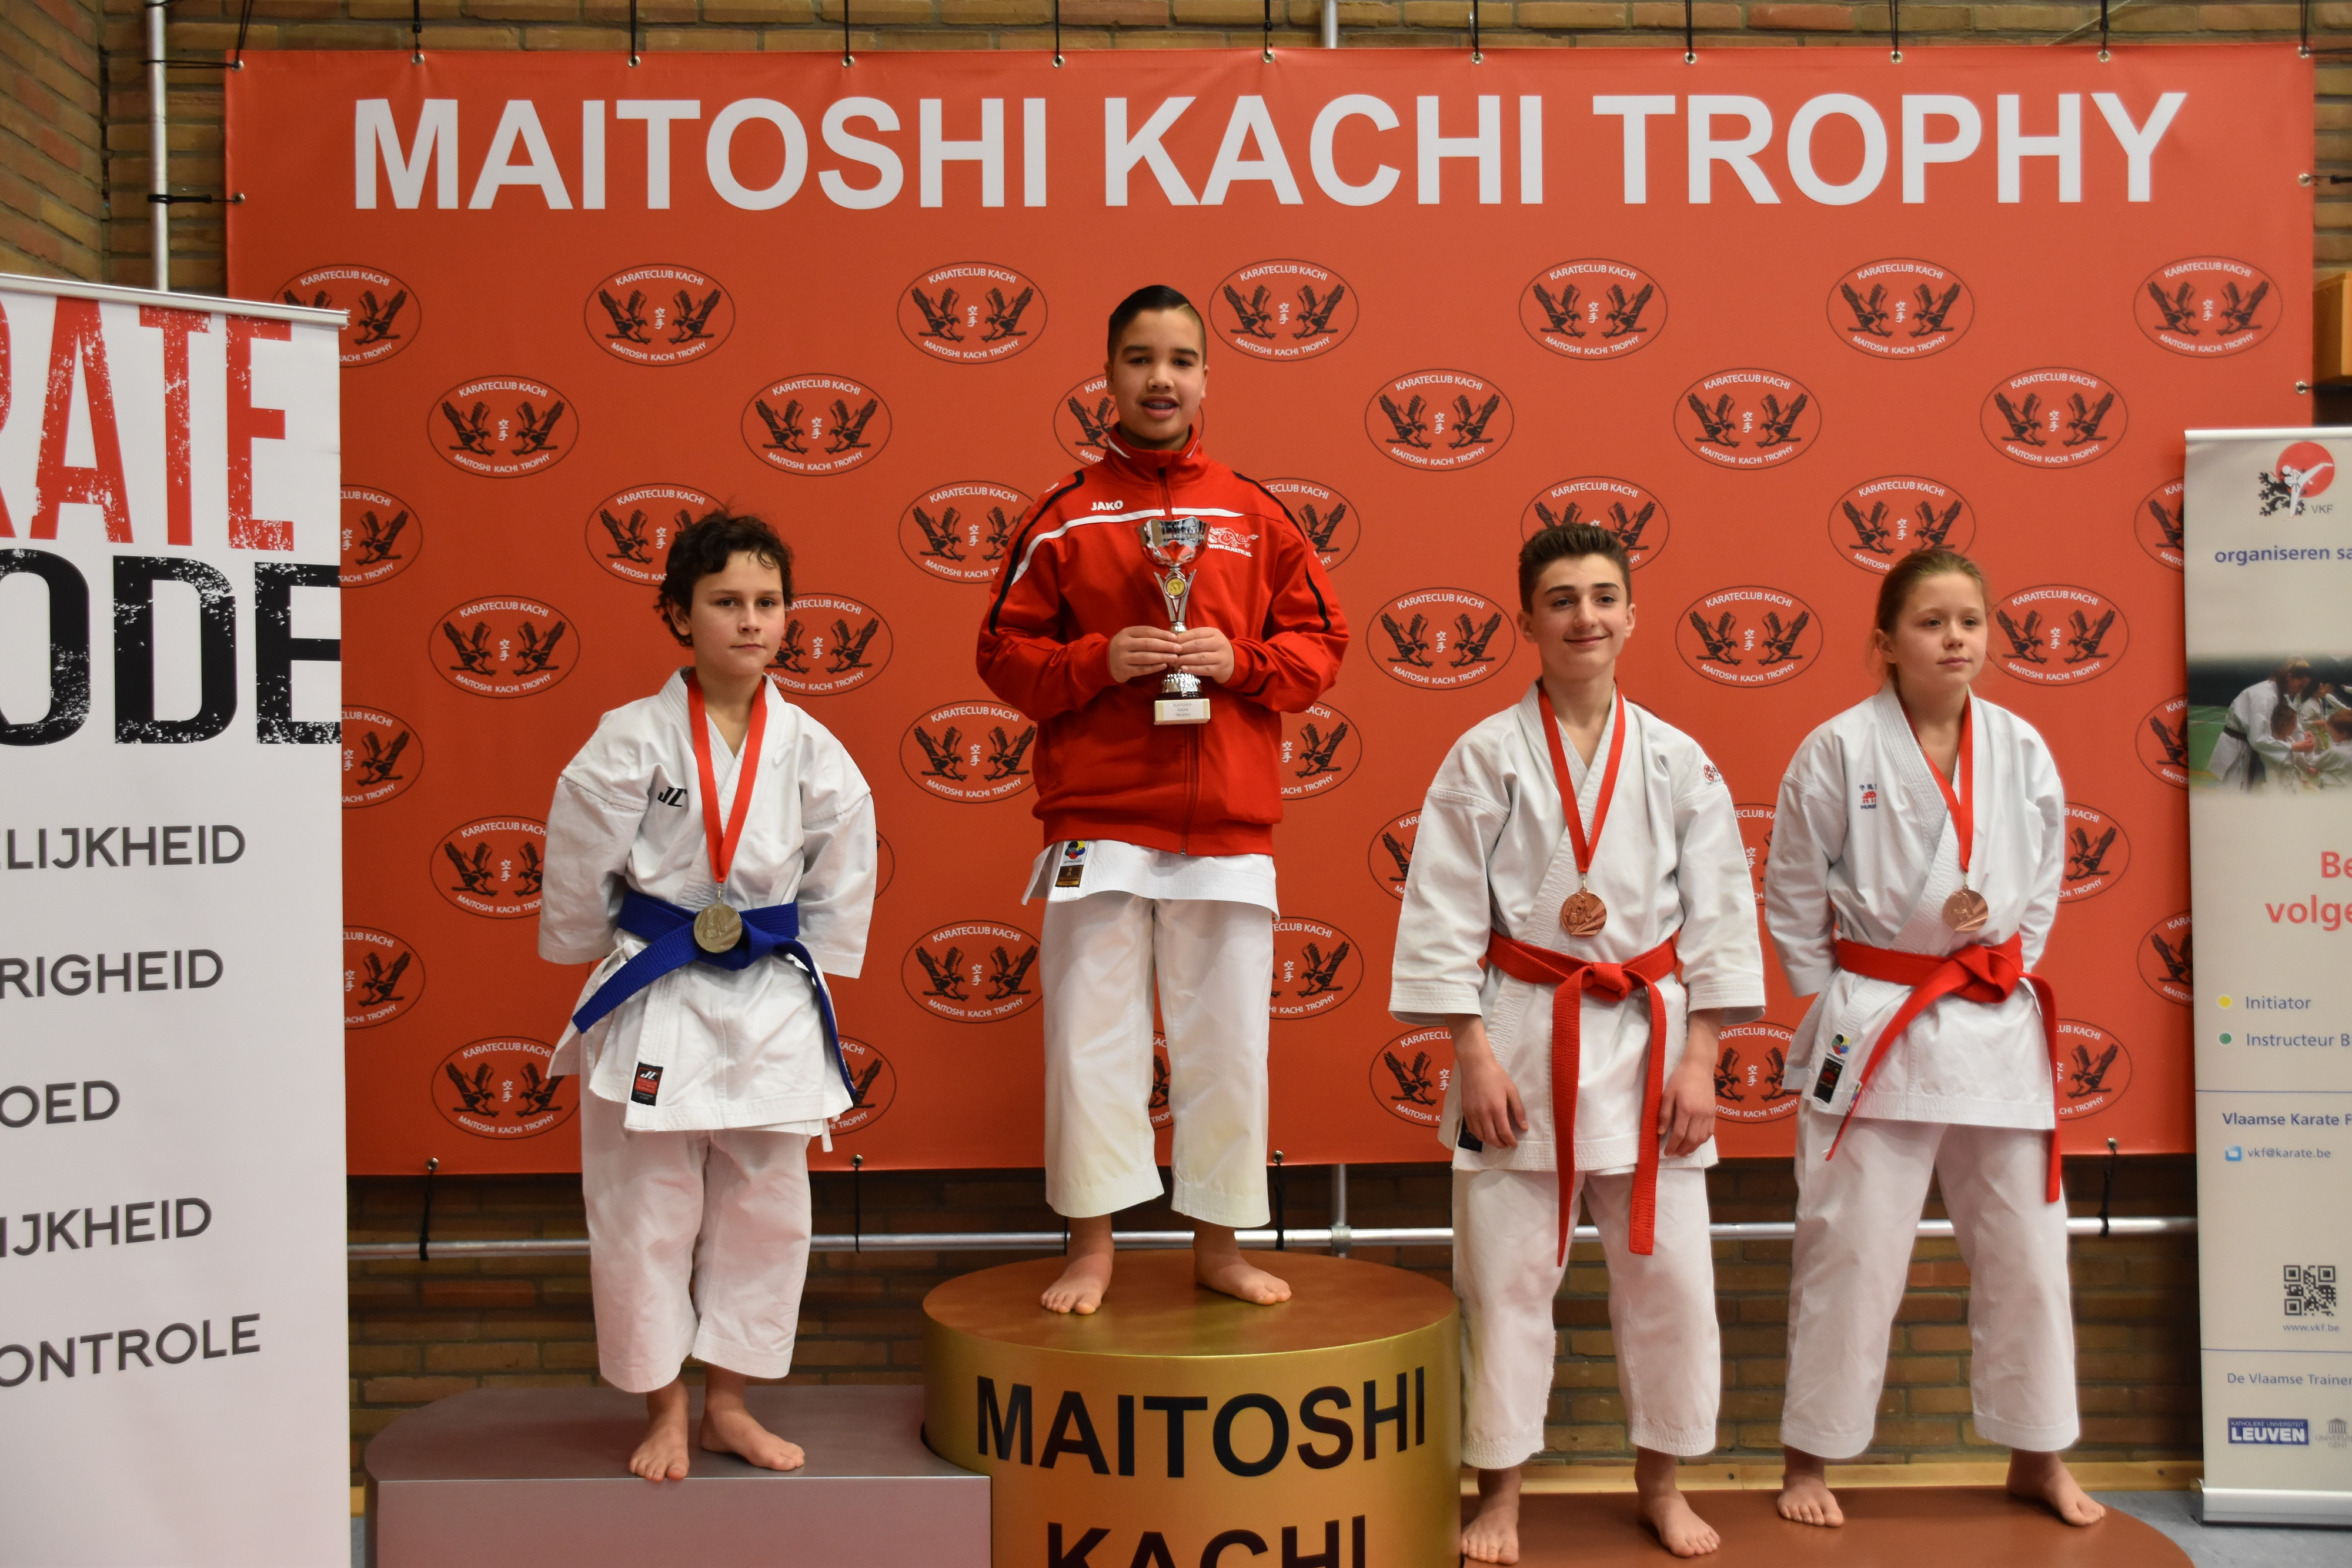 Maitoshi Kachi Trophy te Ninove/België